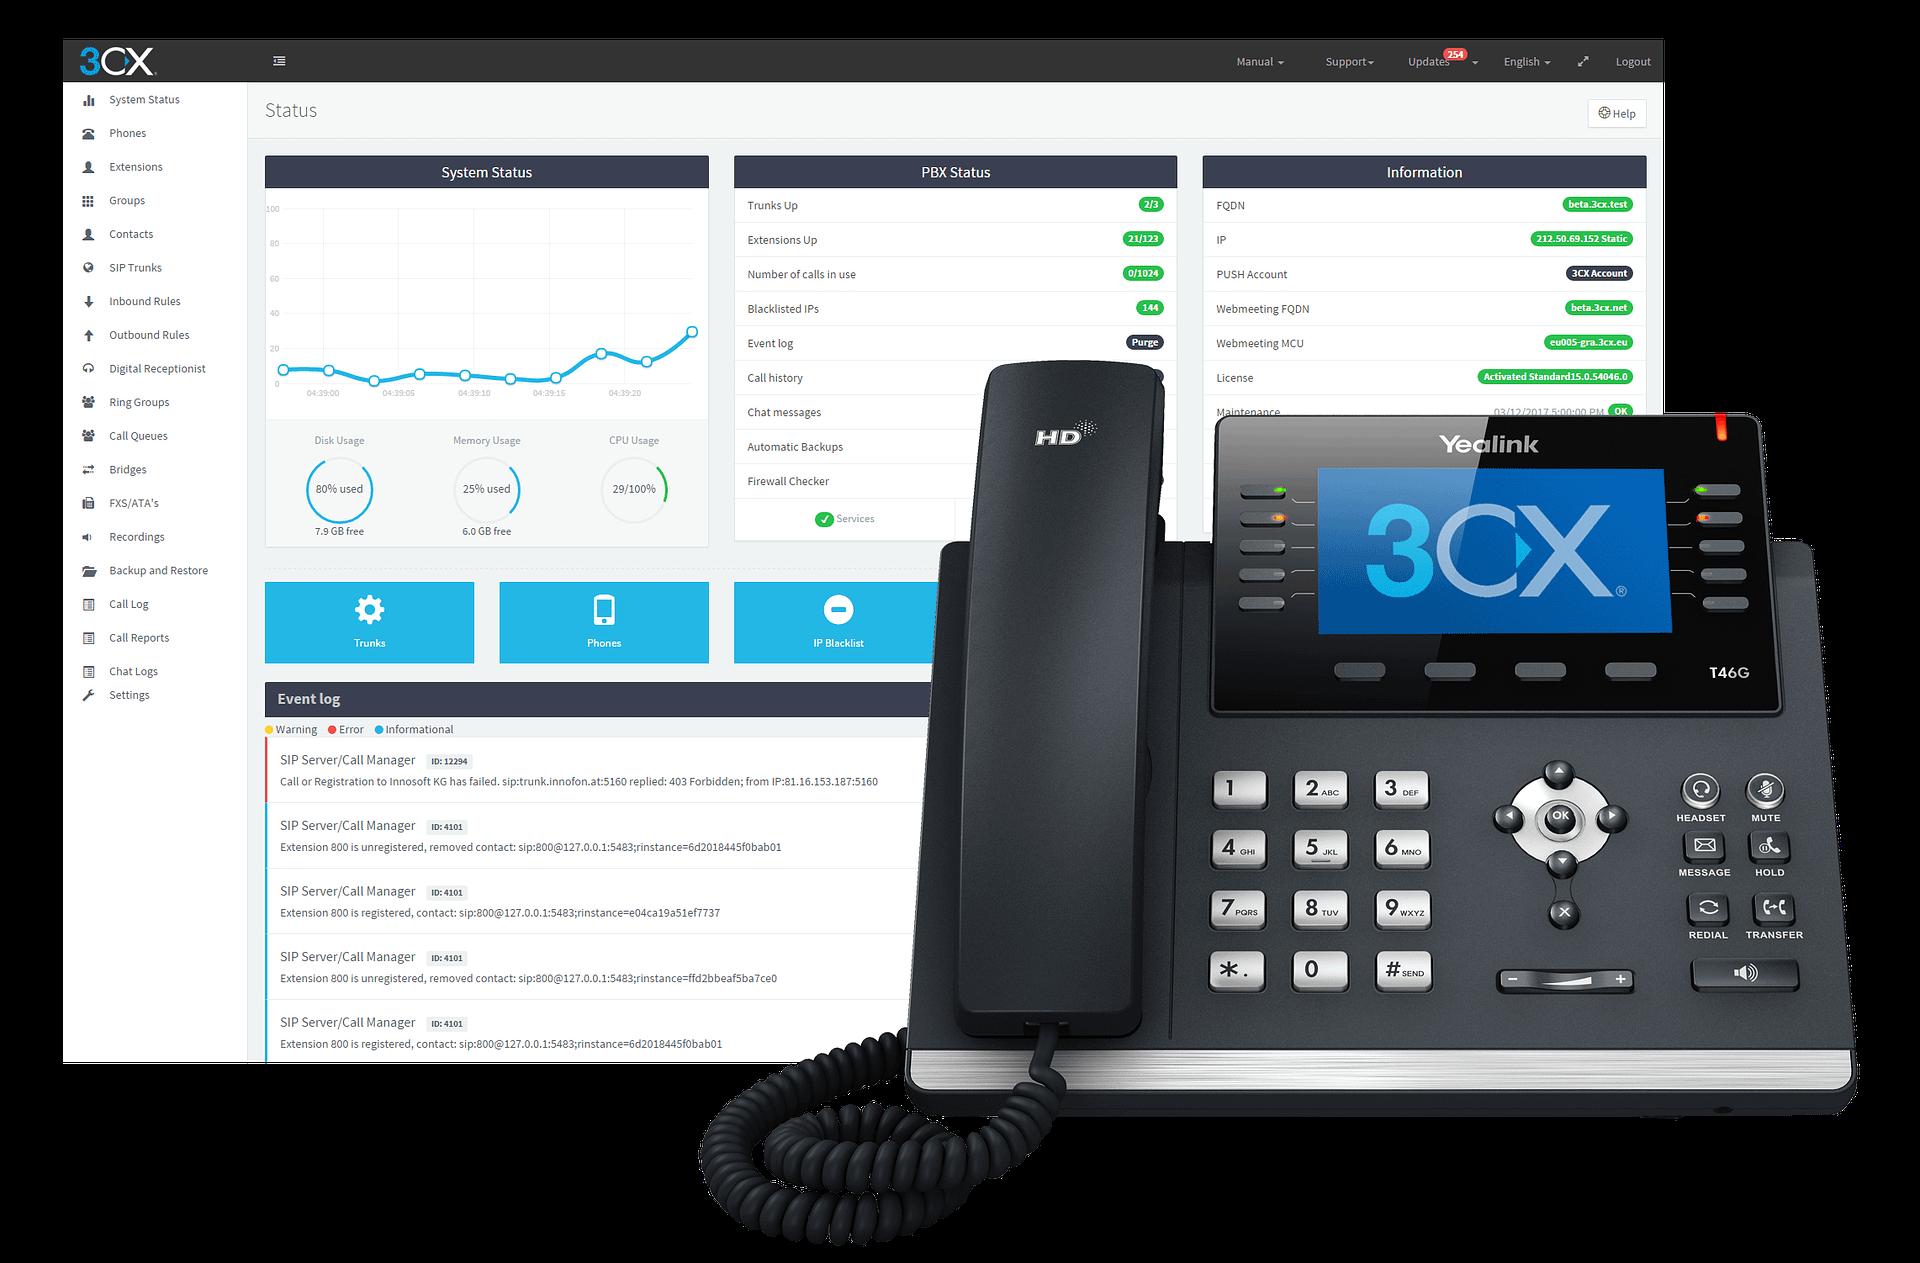 3CX Desk Phone